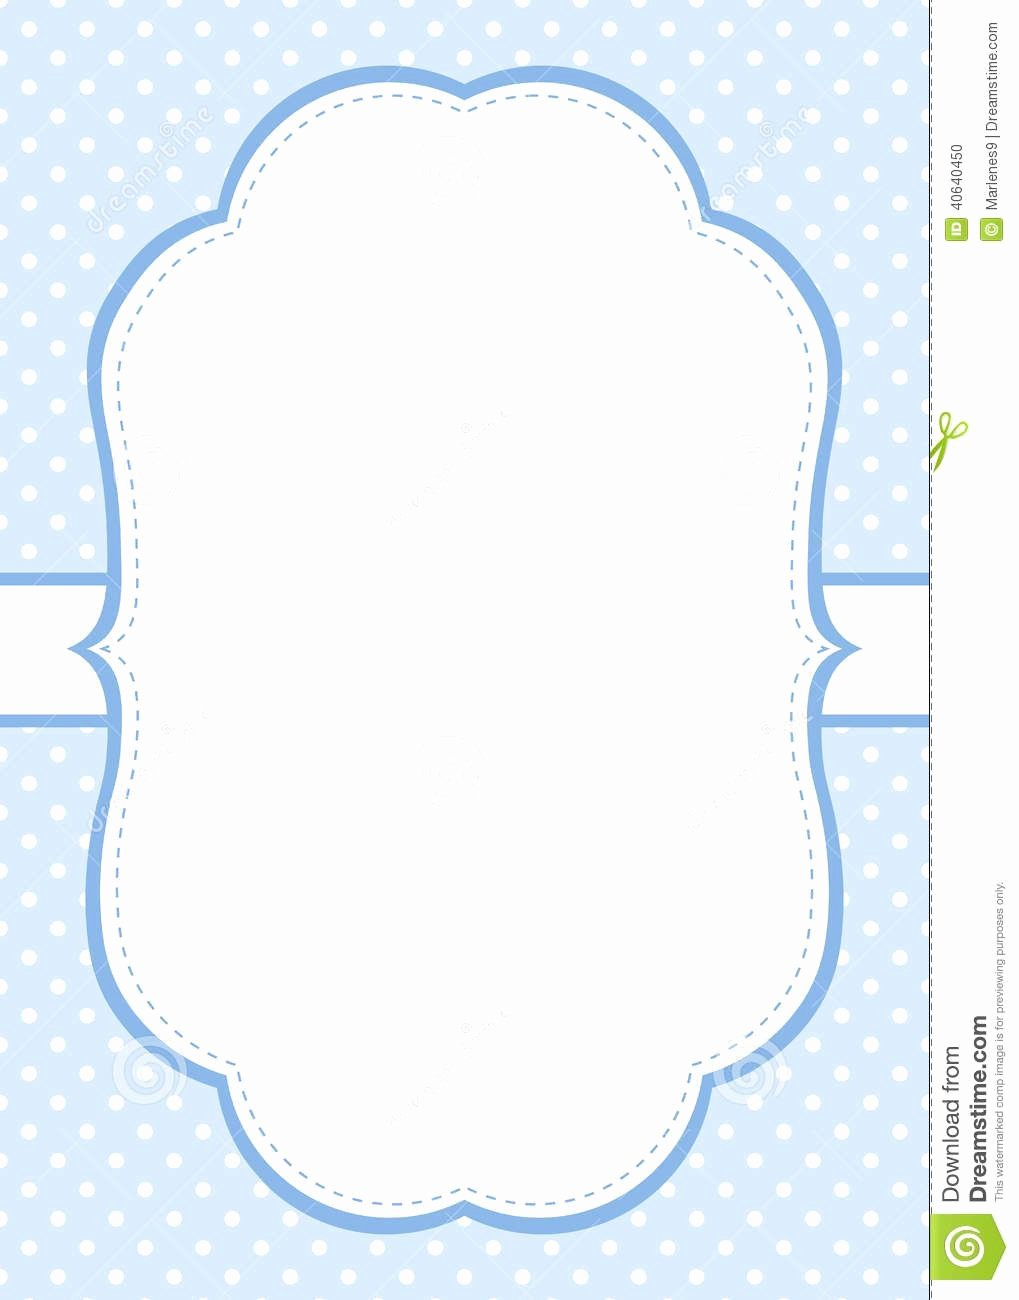 Polka Dot Invitation Template Beautiful Blue Polka Dot Invitation Template Download From Over 36